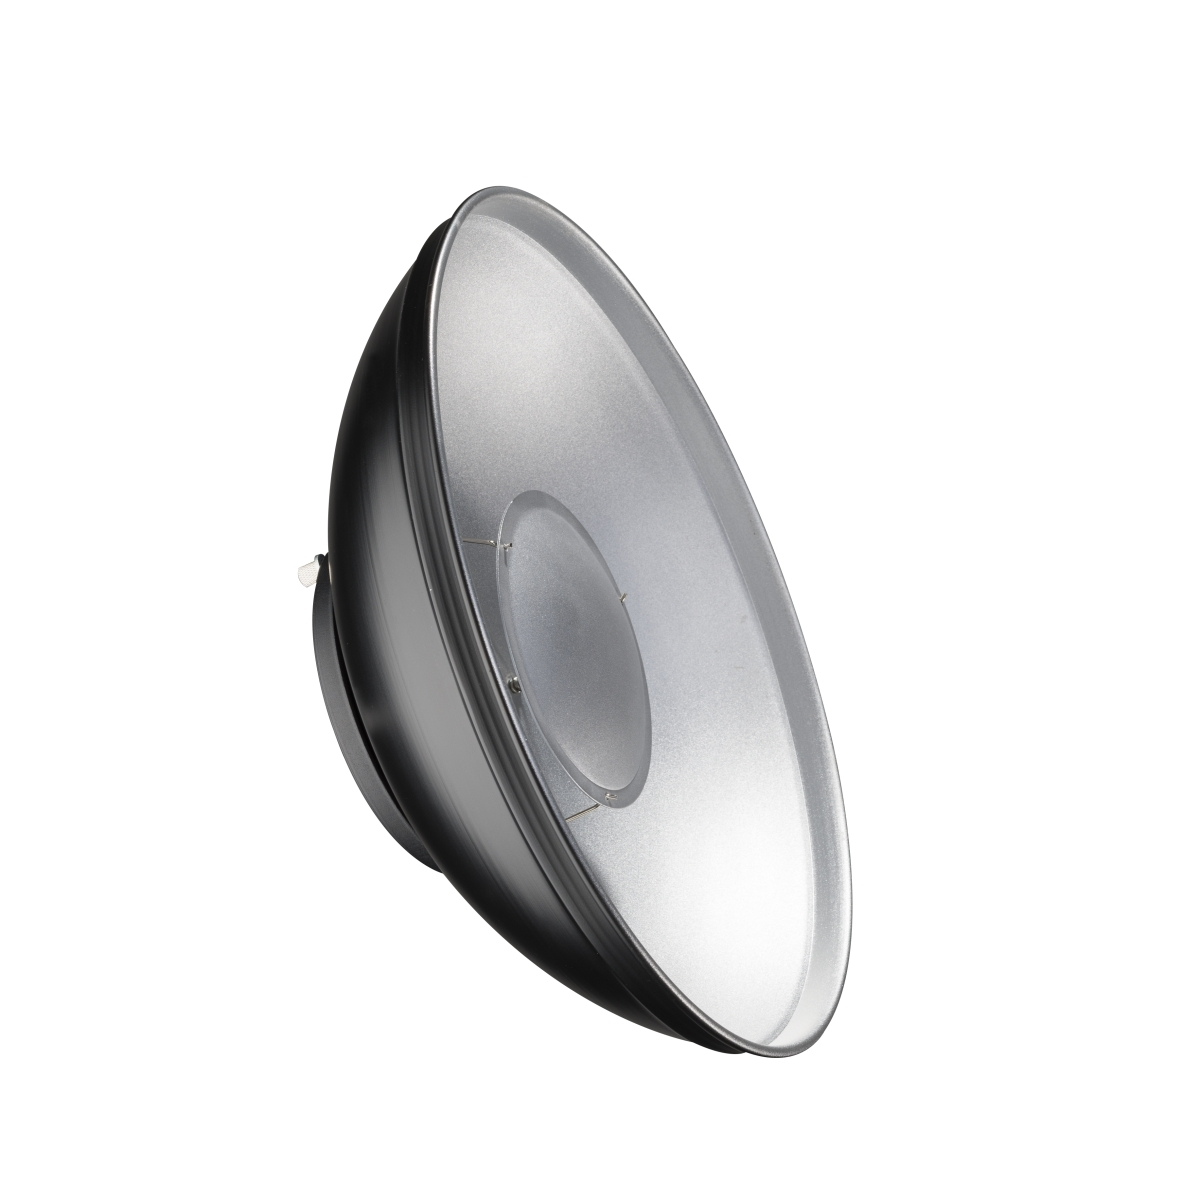 Walimex Universal Beauty Dish 71cm Electra small